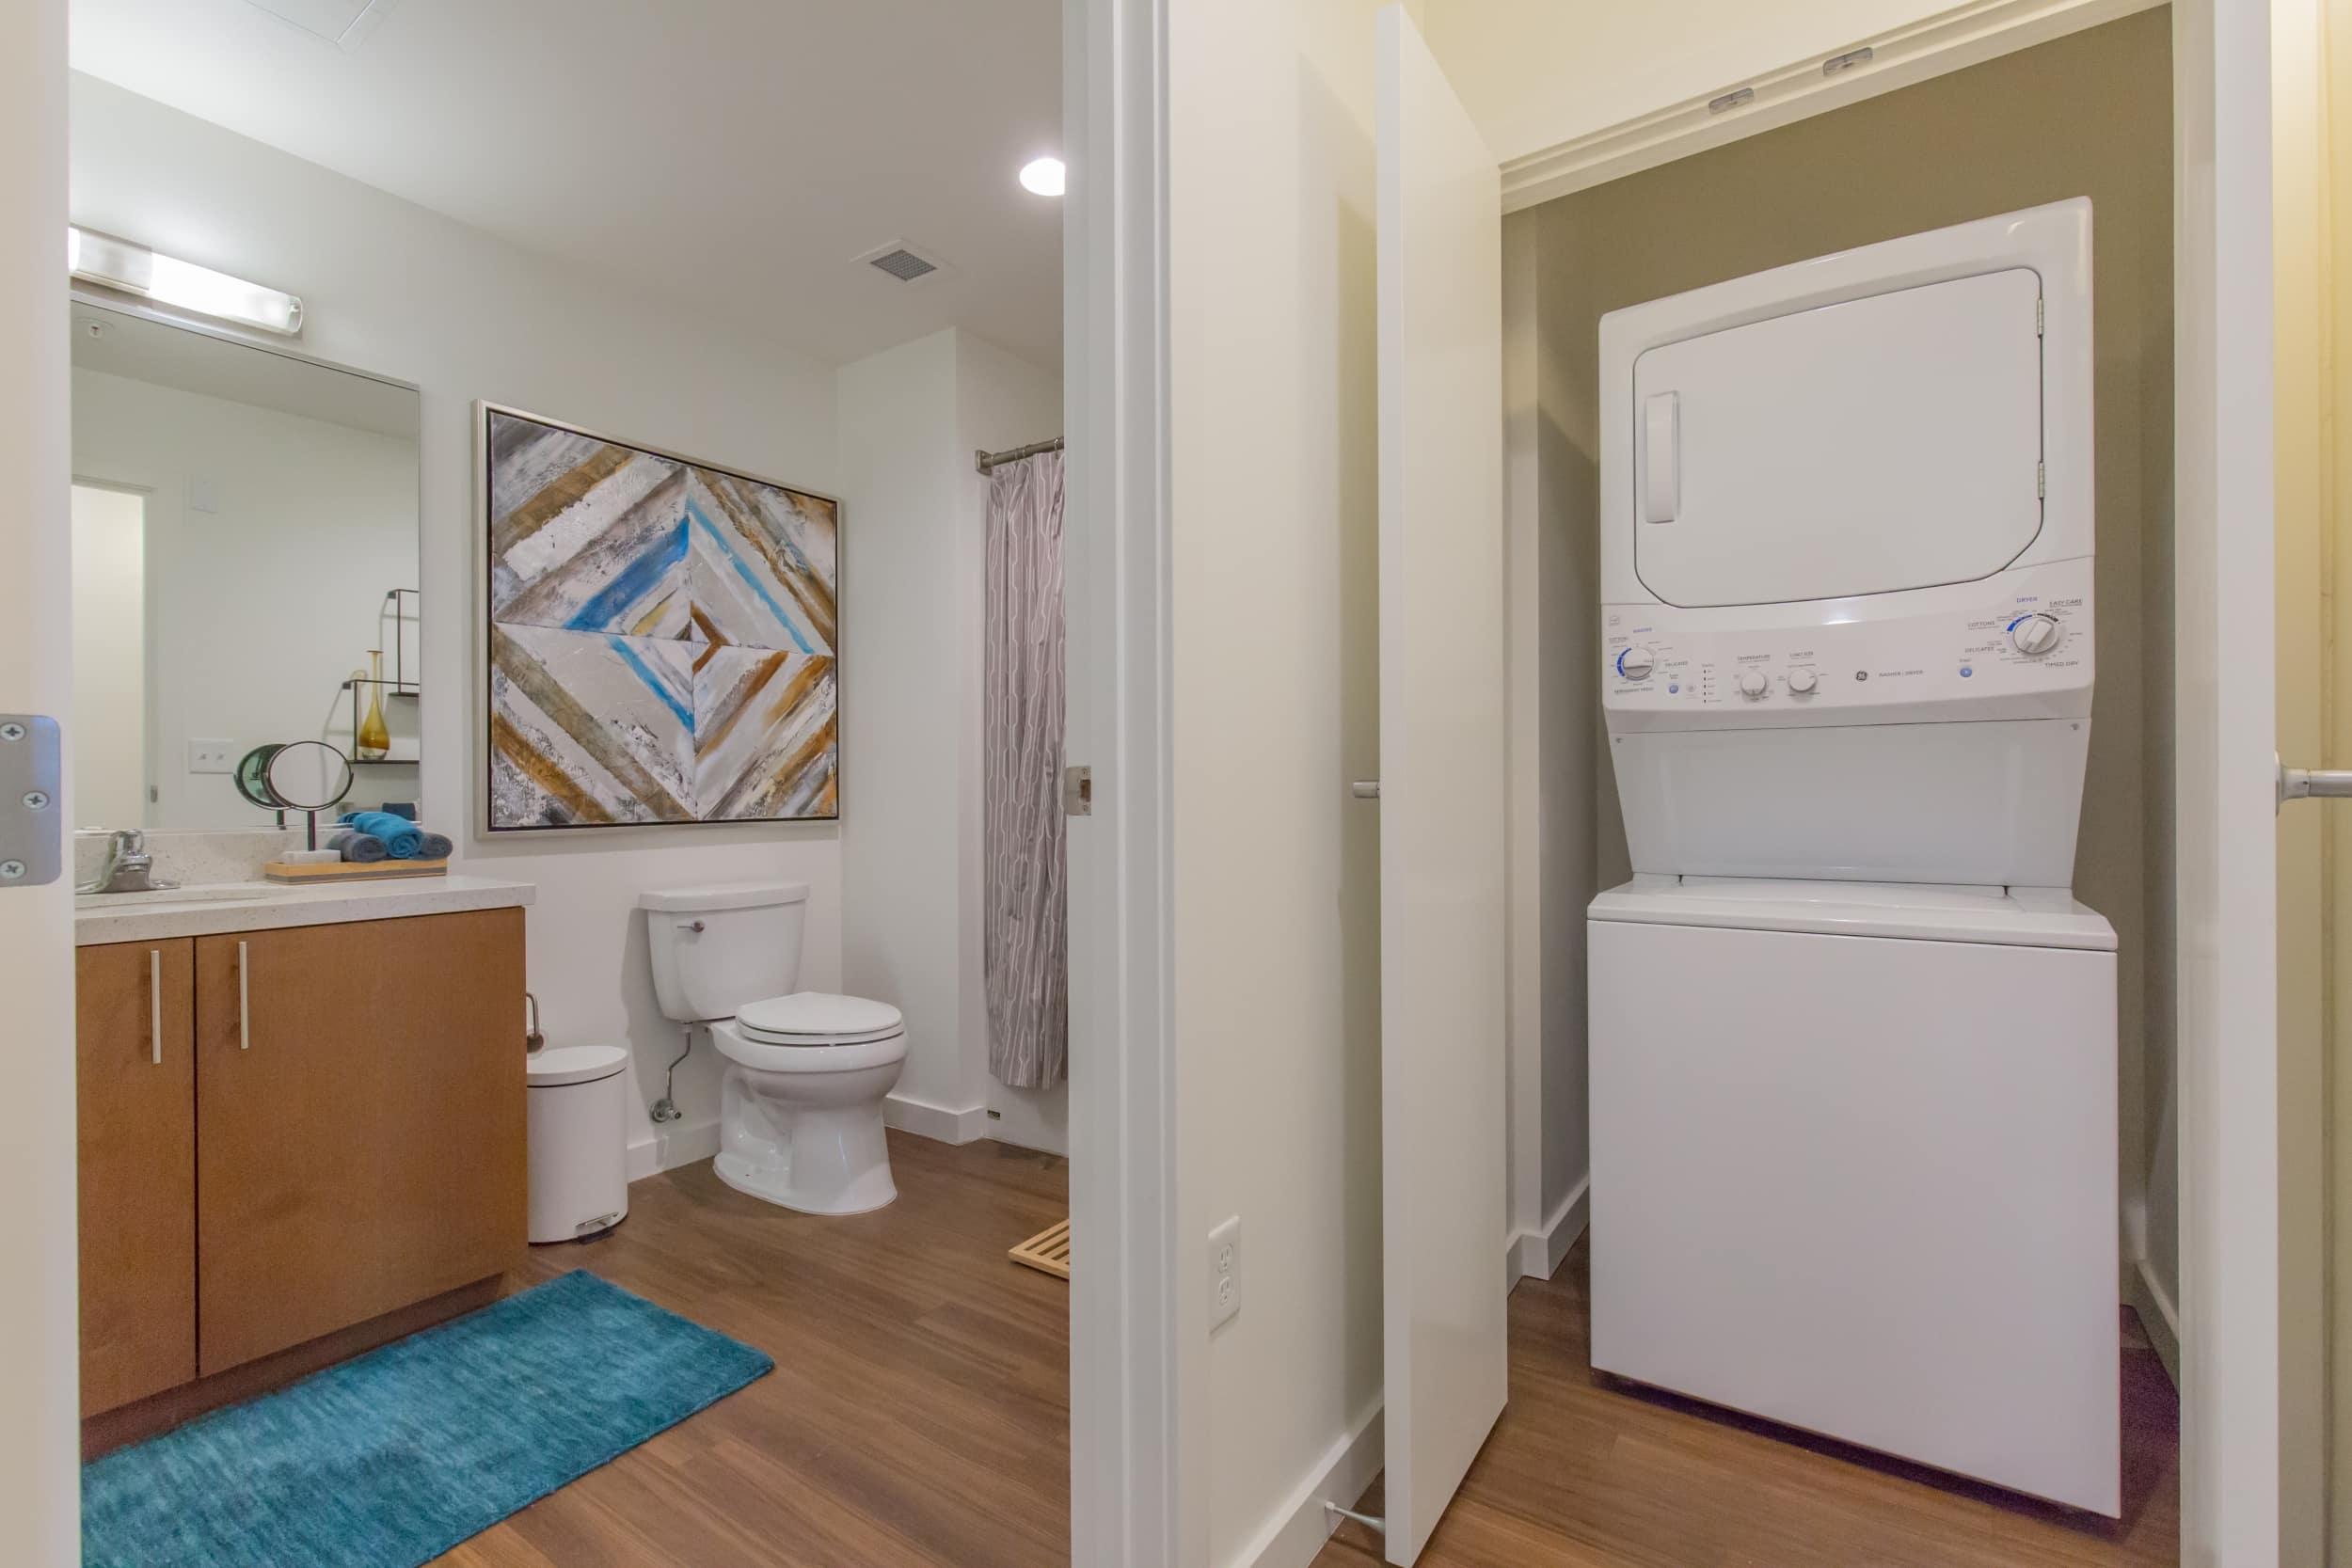 Full-Size ENERGY STAR Washers & Dryers